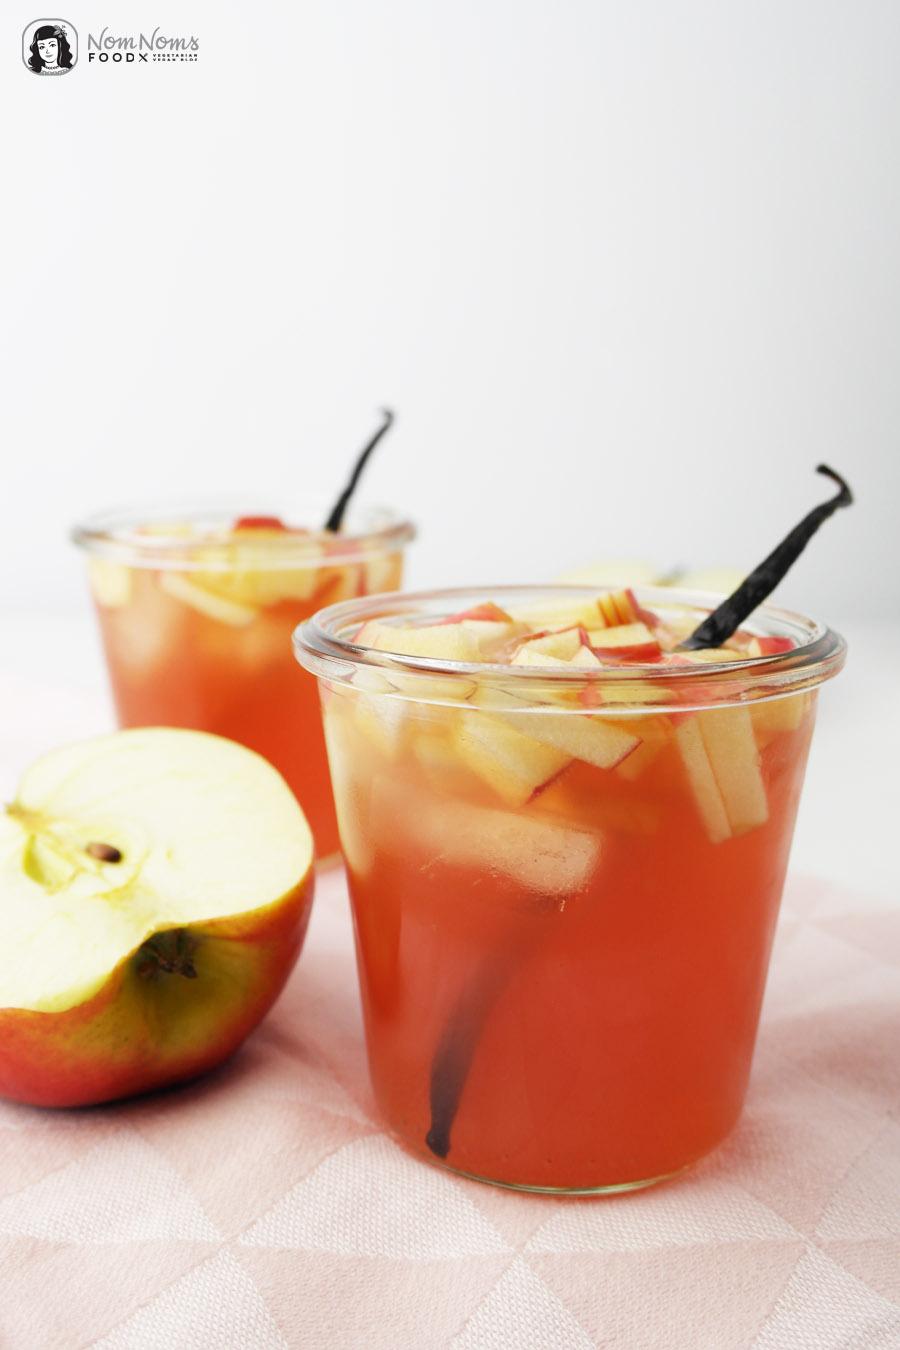 Apfel-Hibiskus-Eistee mit Vanille